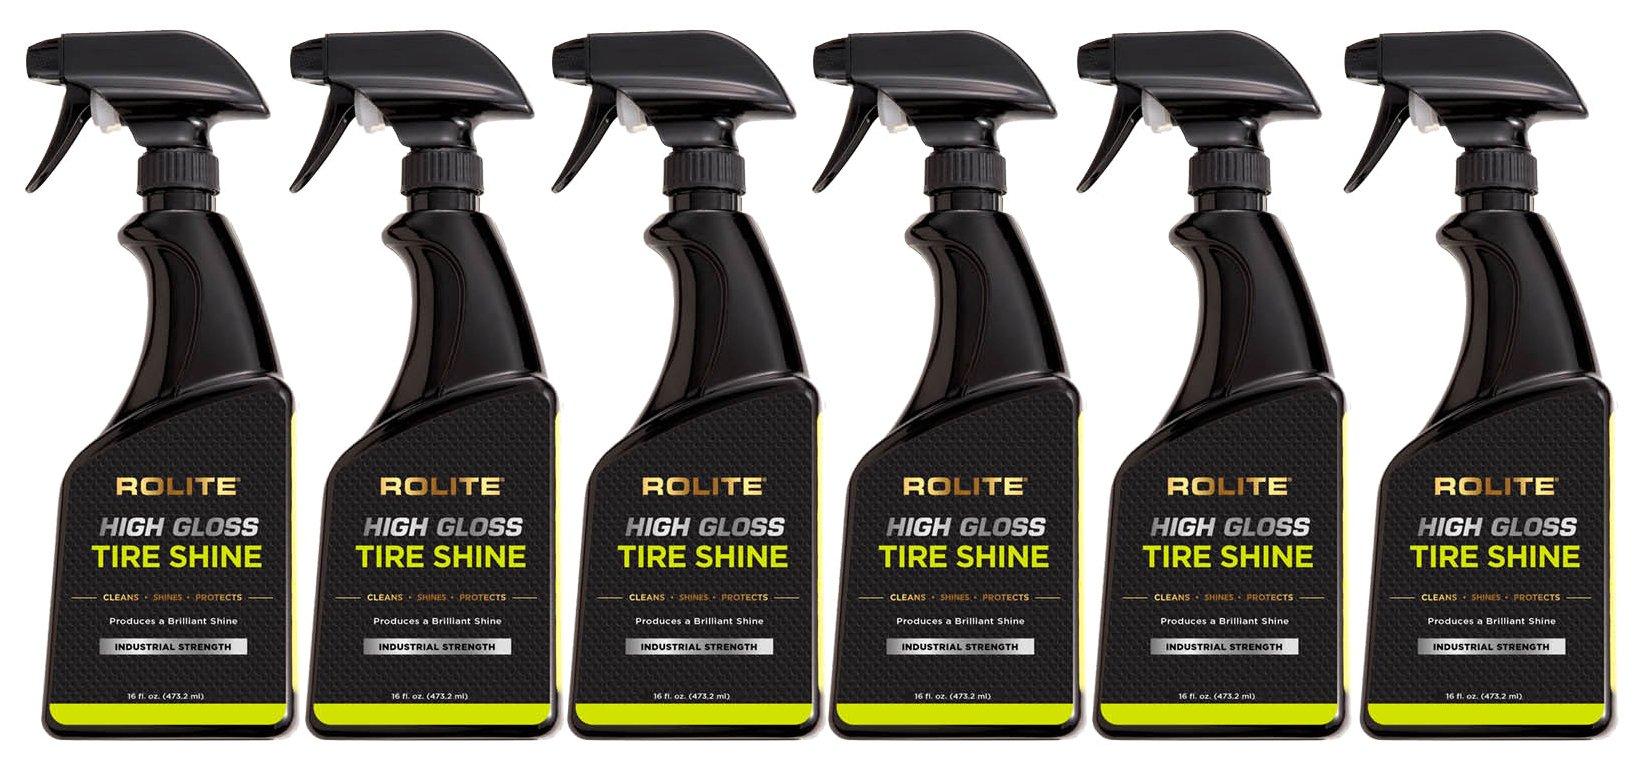 Rolite High Gloss Tire Shine (16 fl. oz.) for the Deep, Black Wet Look. Tire Dressing that Keeps the Tires Black Longer 6 Pack